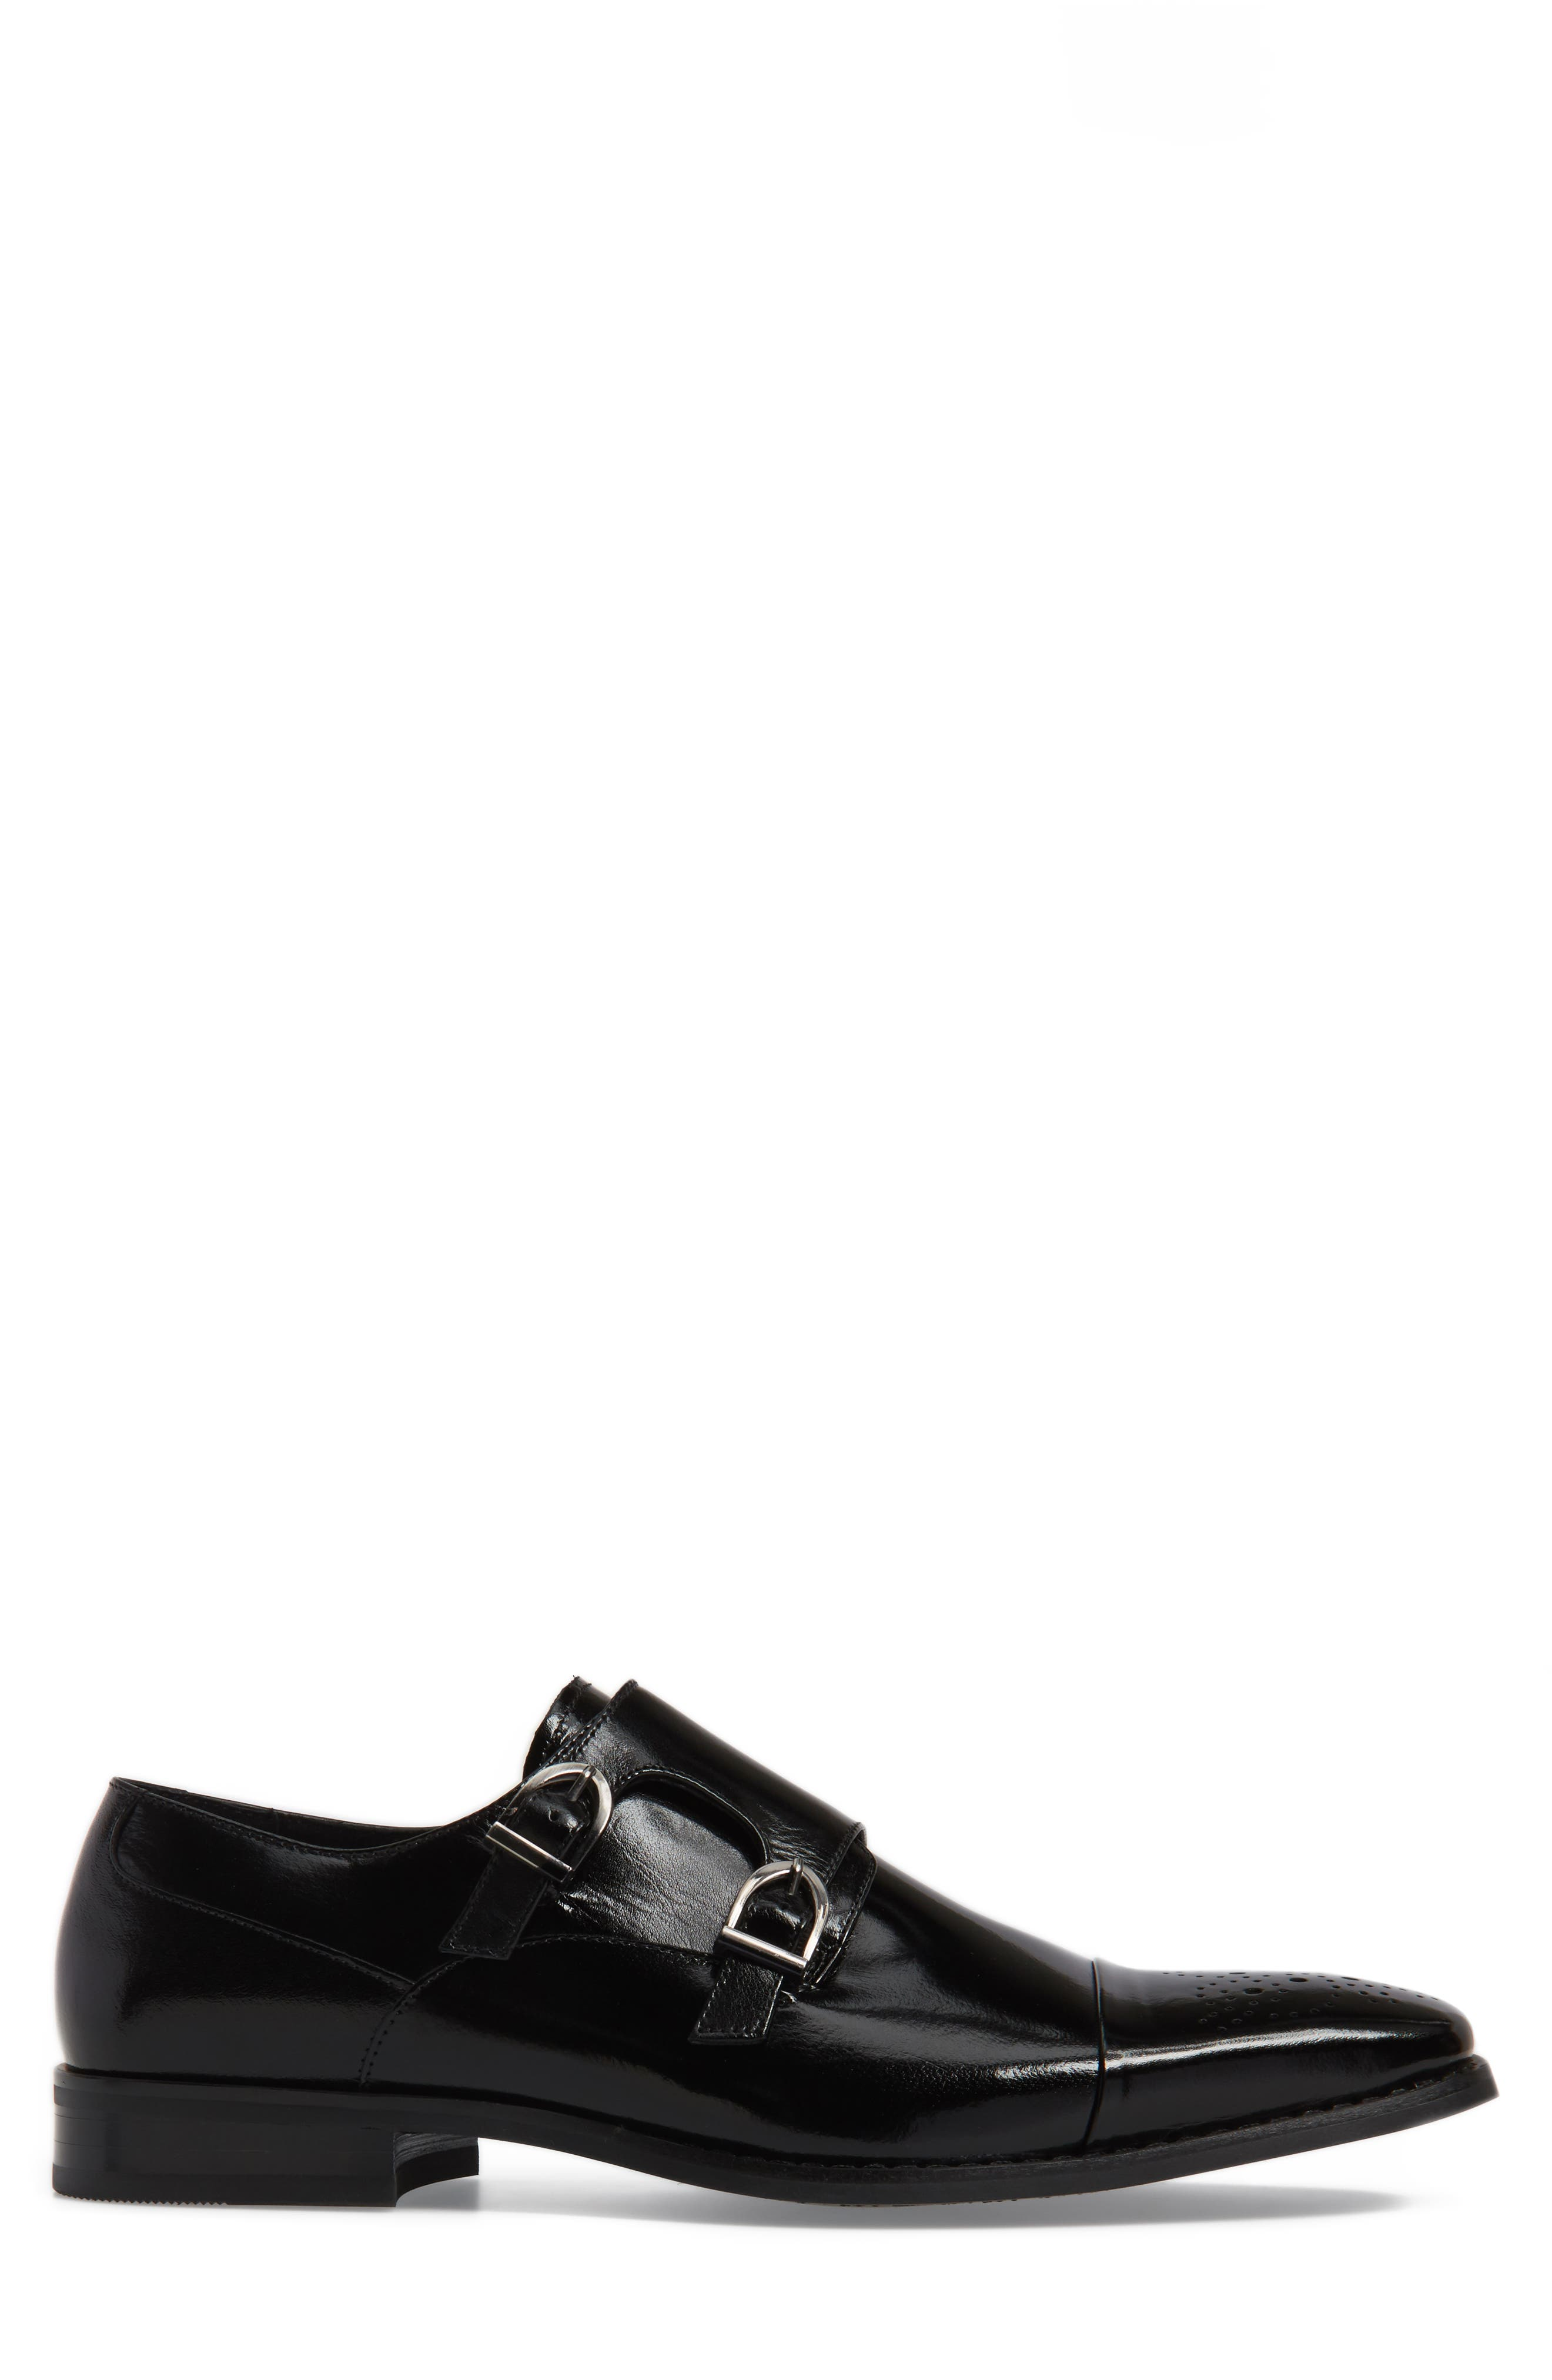 Alternate Image 3  - Stacy Adams Trevor Double Monk Strap Shoe (Men)